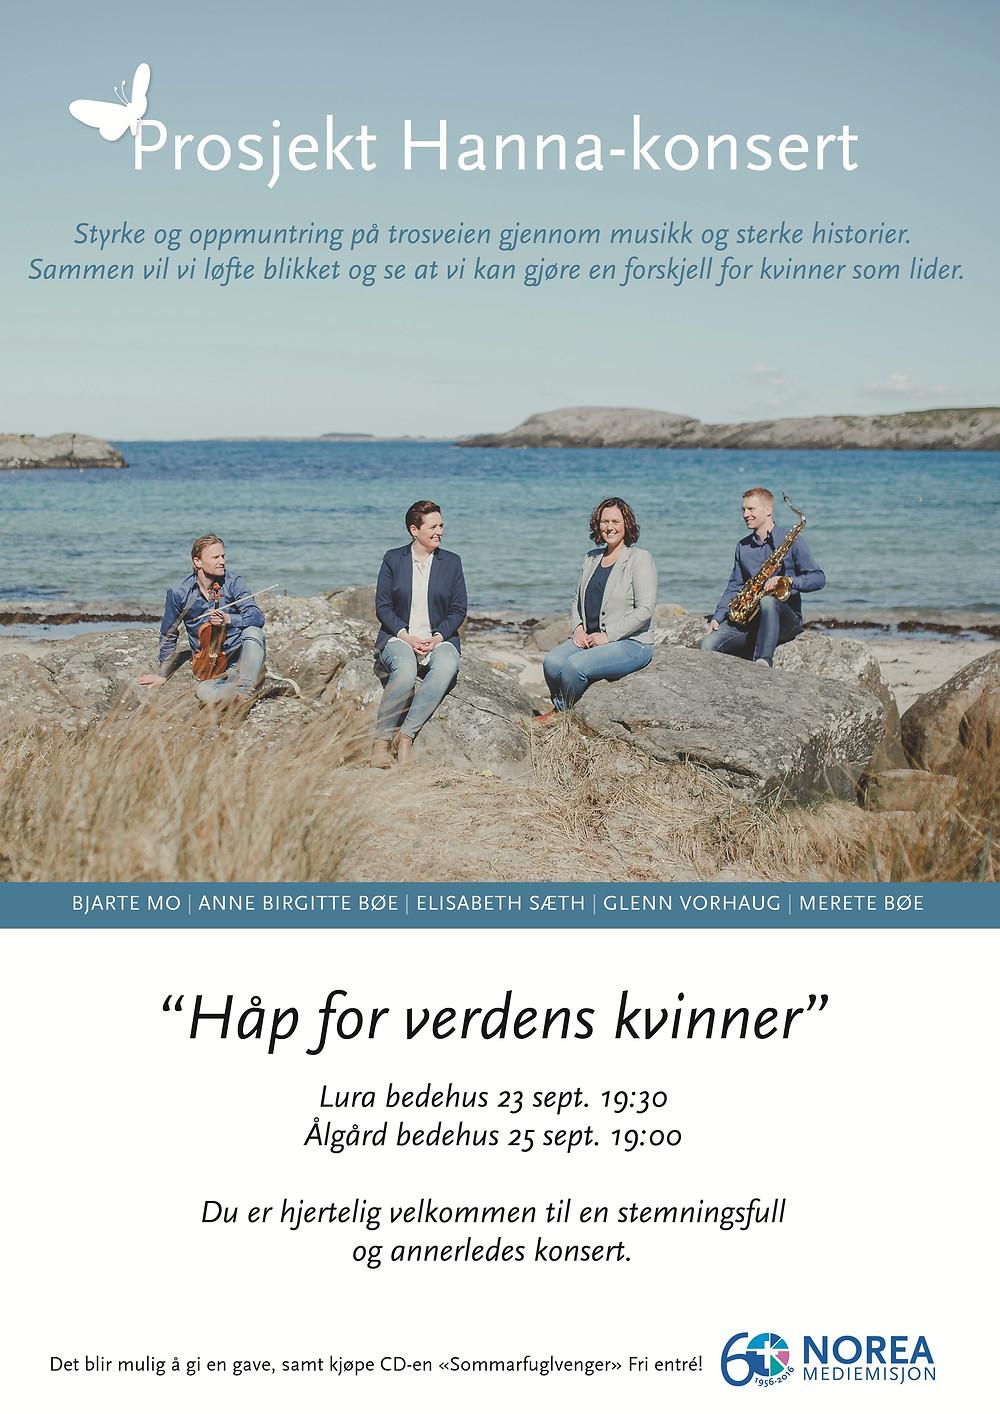 Prosjekt Hanna-konsert